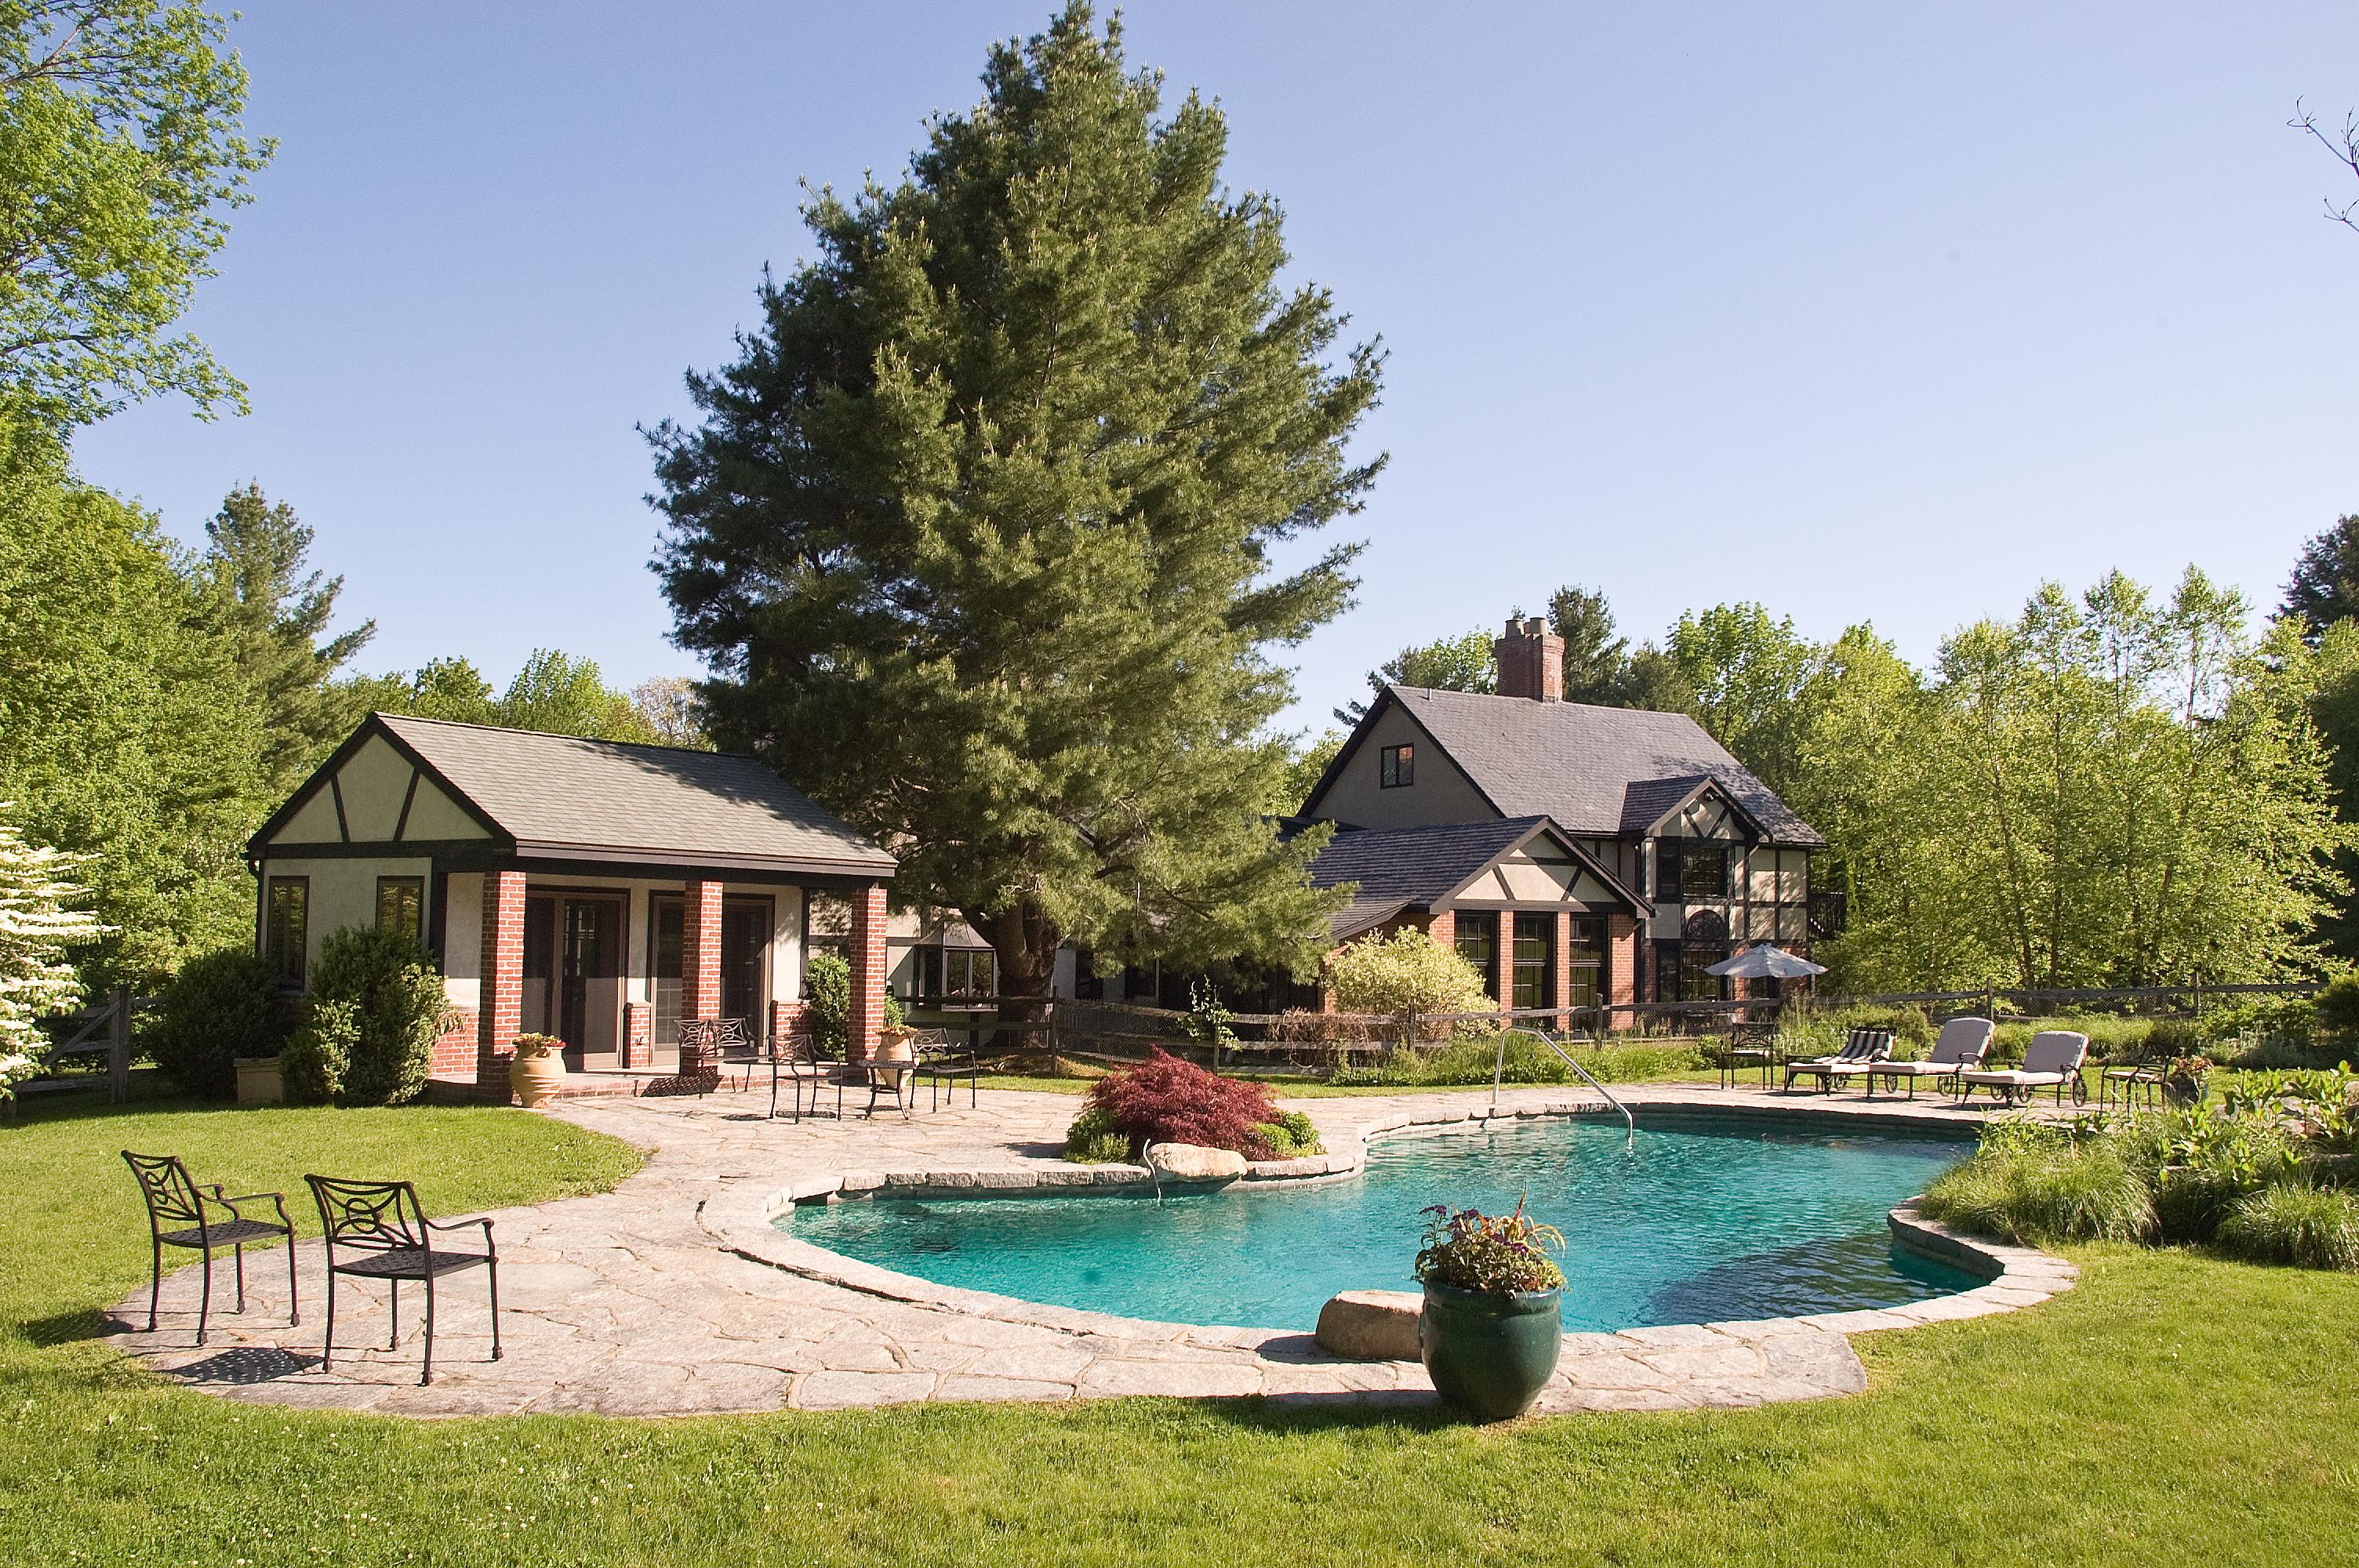 Casa Unifamiliar por un Venta en Luxurious Tudor on 25 Acres 317 Milton Rd Litchfield, Connecticut 06759 Estados Unidos